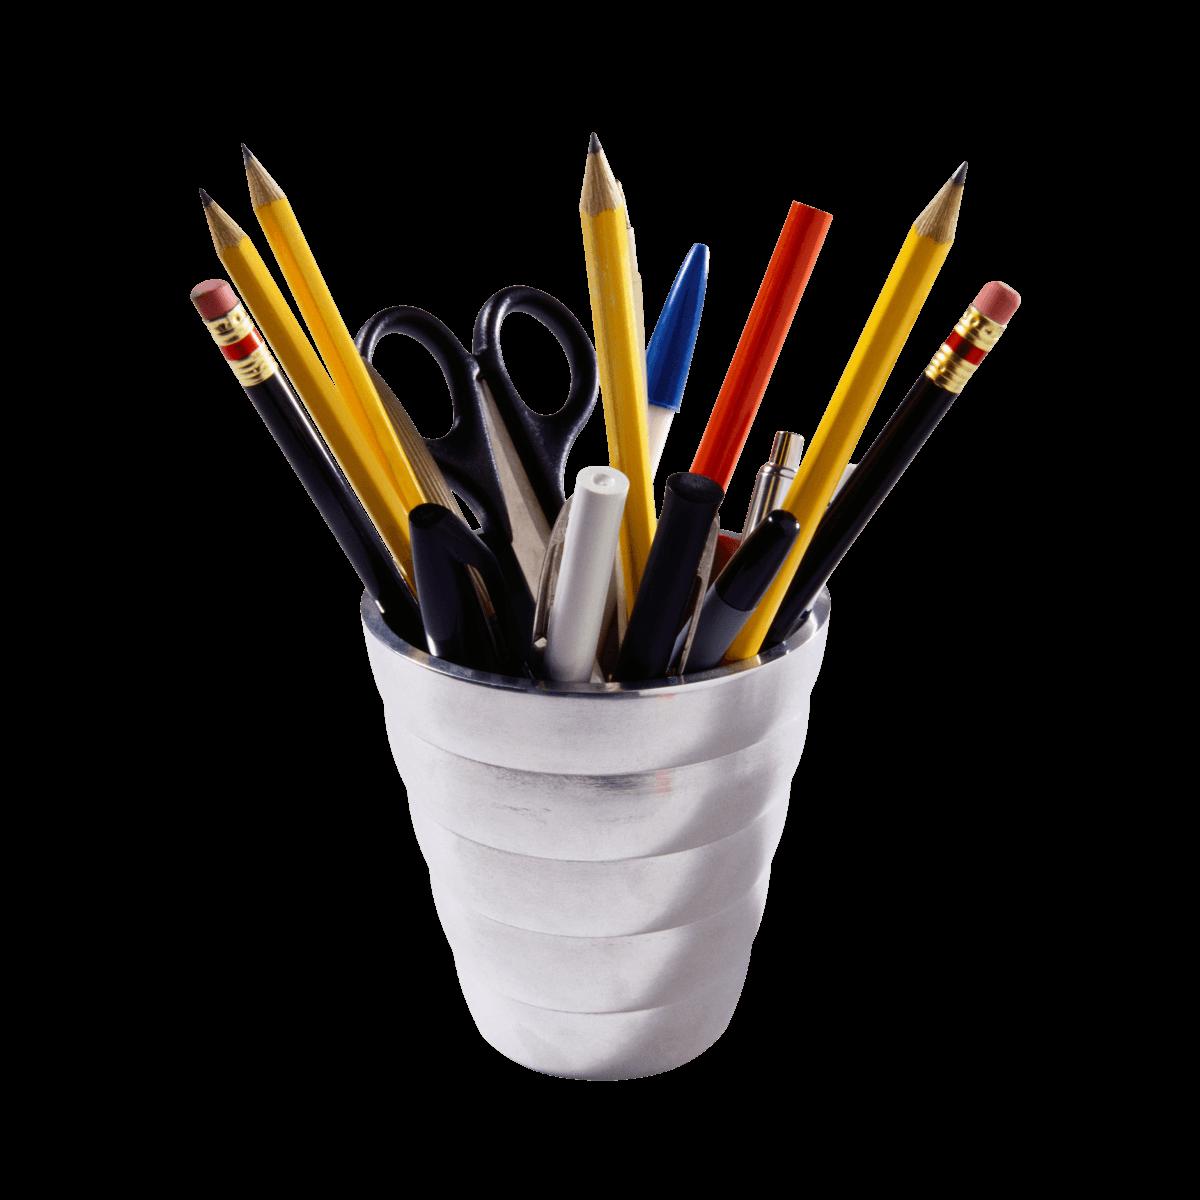 Clipart pencil stationery. Office supplies pot transparent